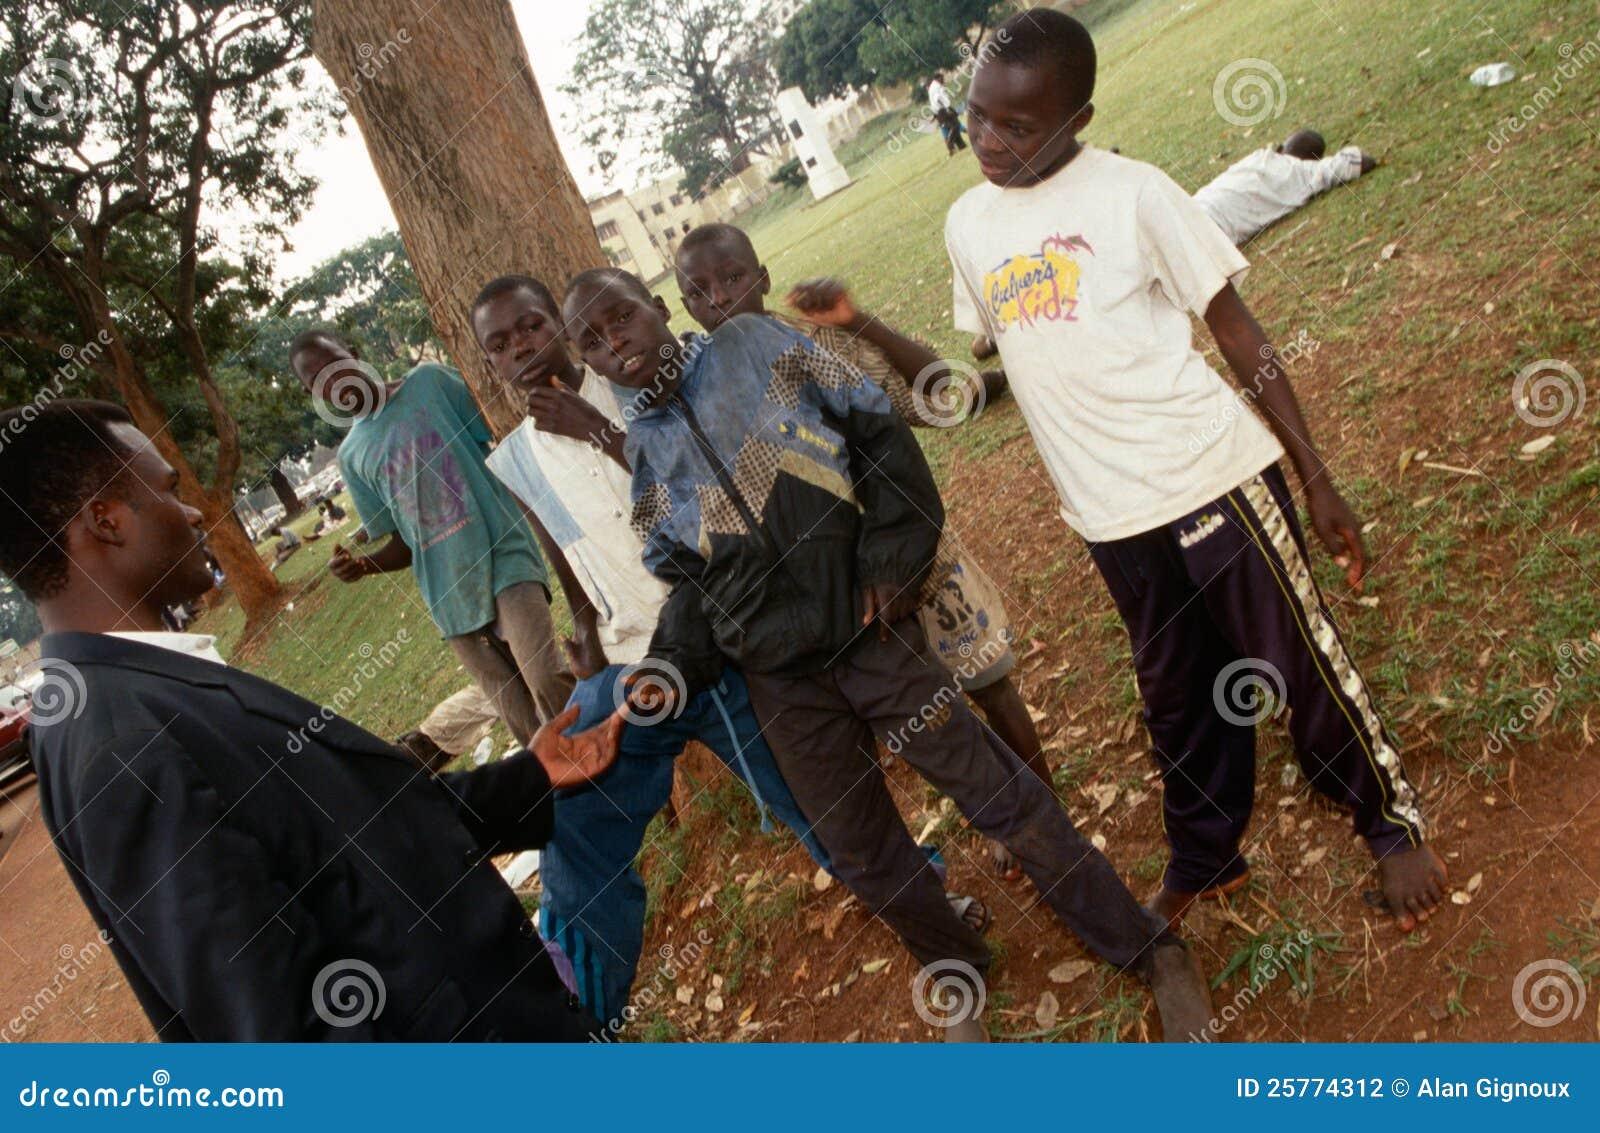 Young glue-sniffing boys in Kampala, Uganda